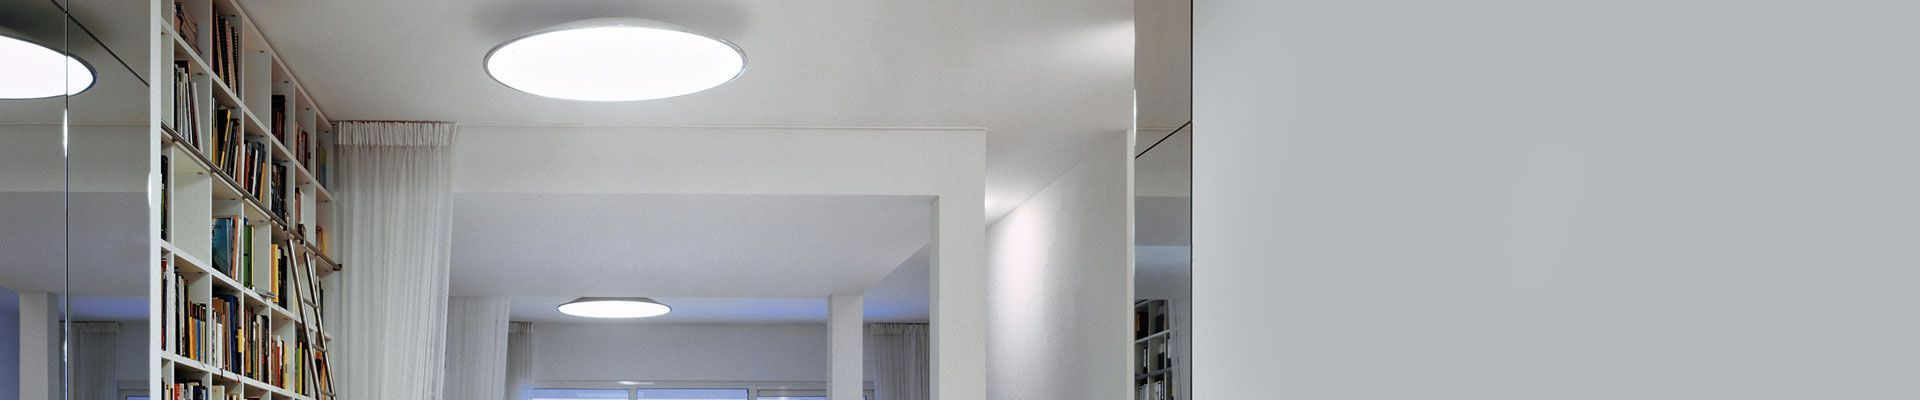 Vibia plafondlampen